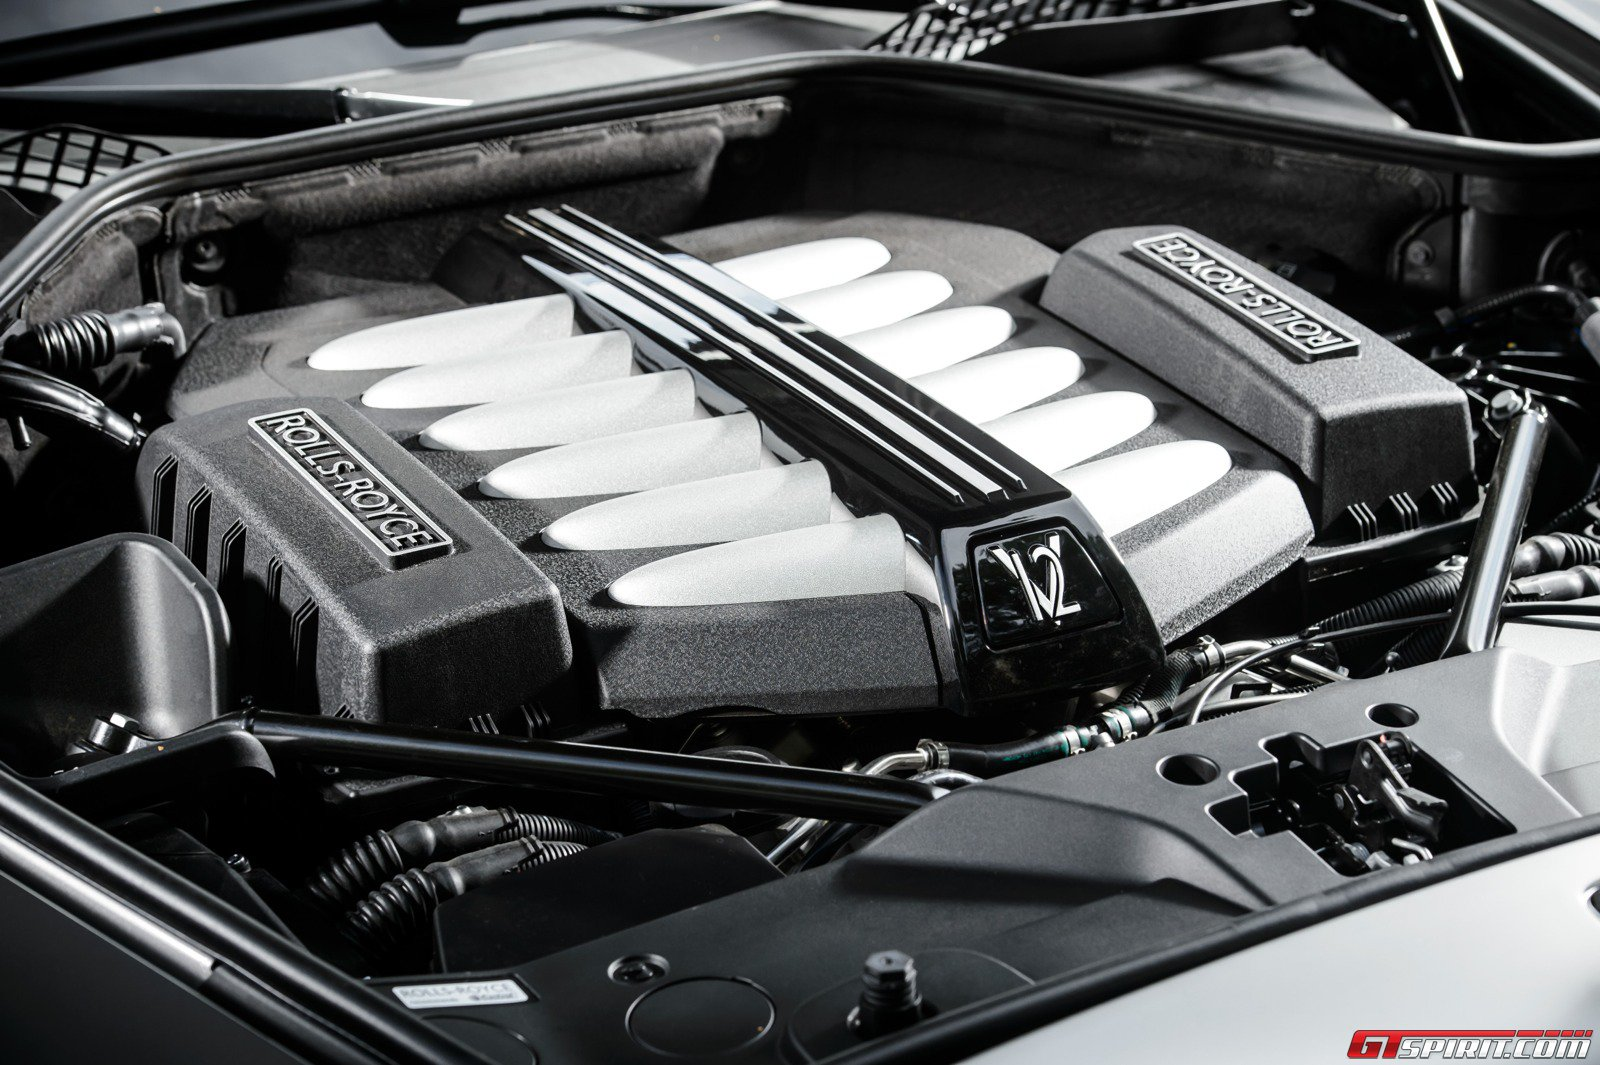 2015 rolls royce ghost series 2 review gtspirit for Rolls royce phantom motor